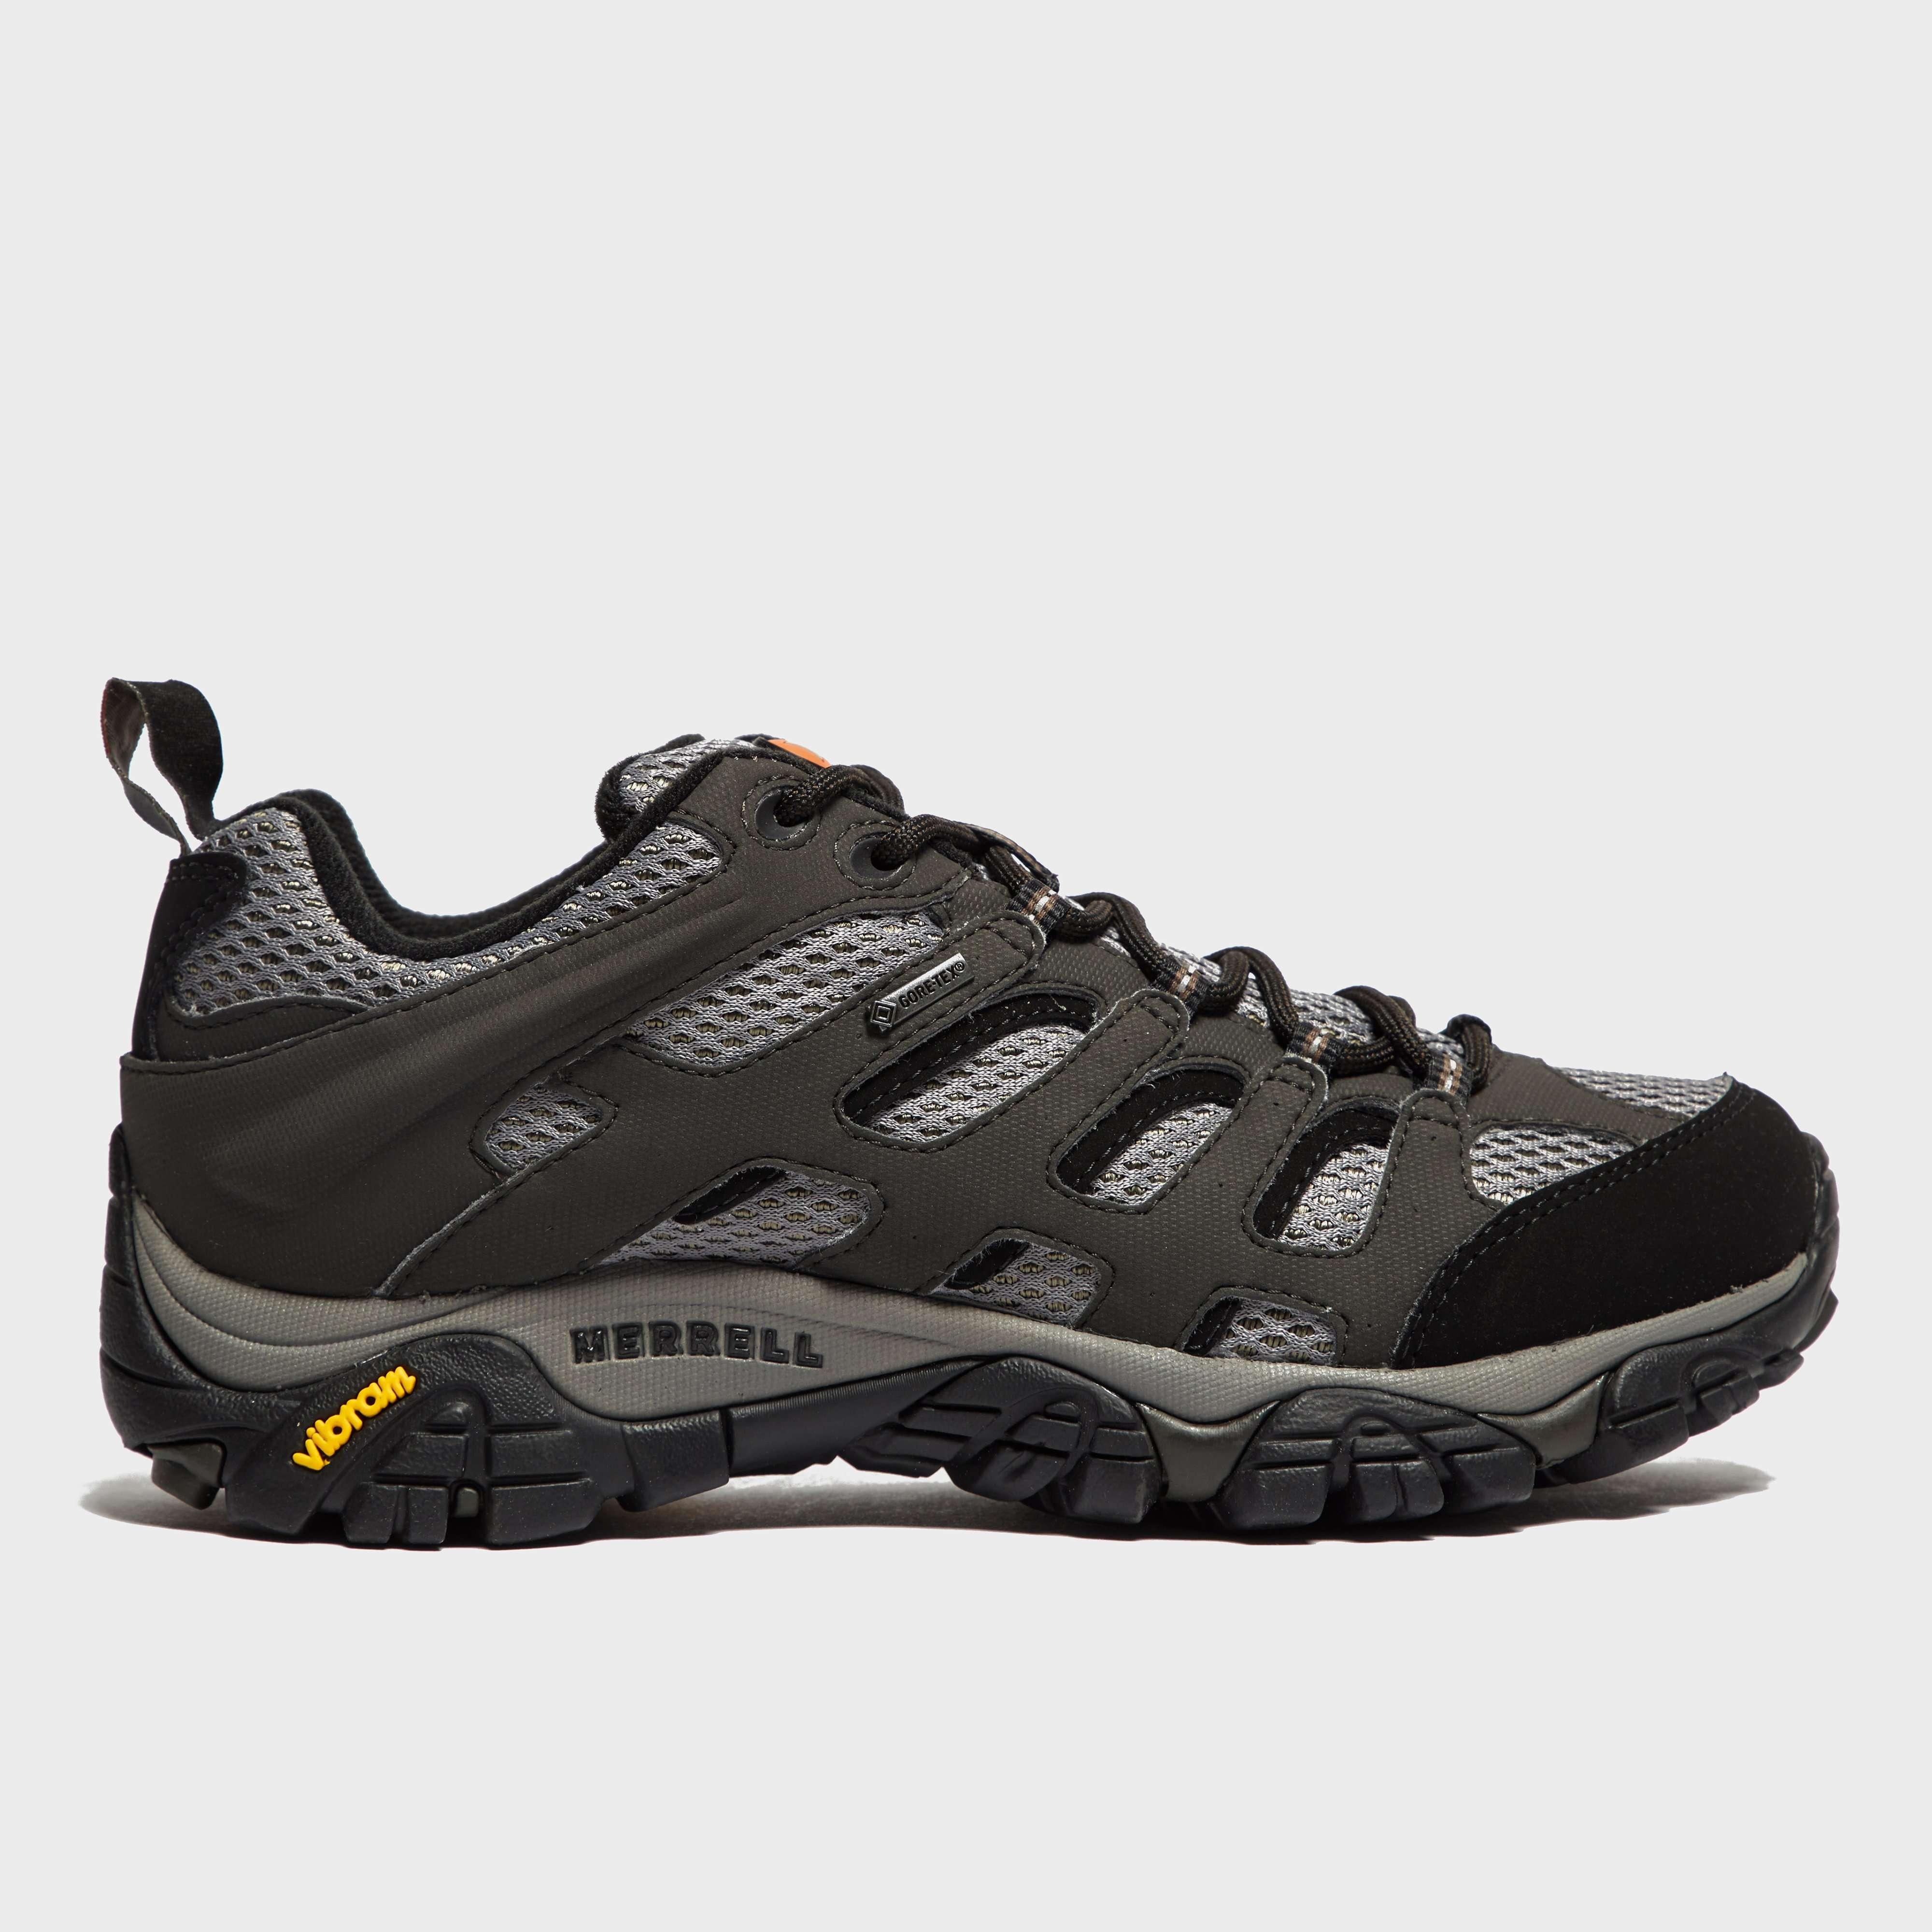 MERRELL Women's Moab 2 GORE-TEX® Shoe